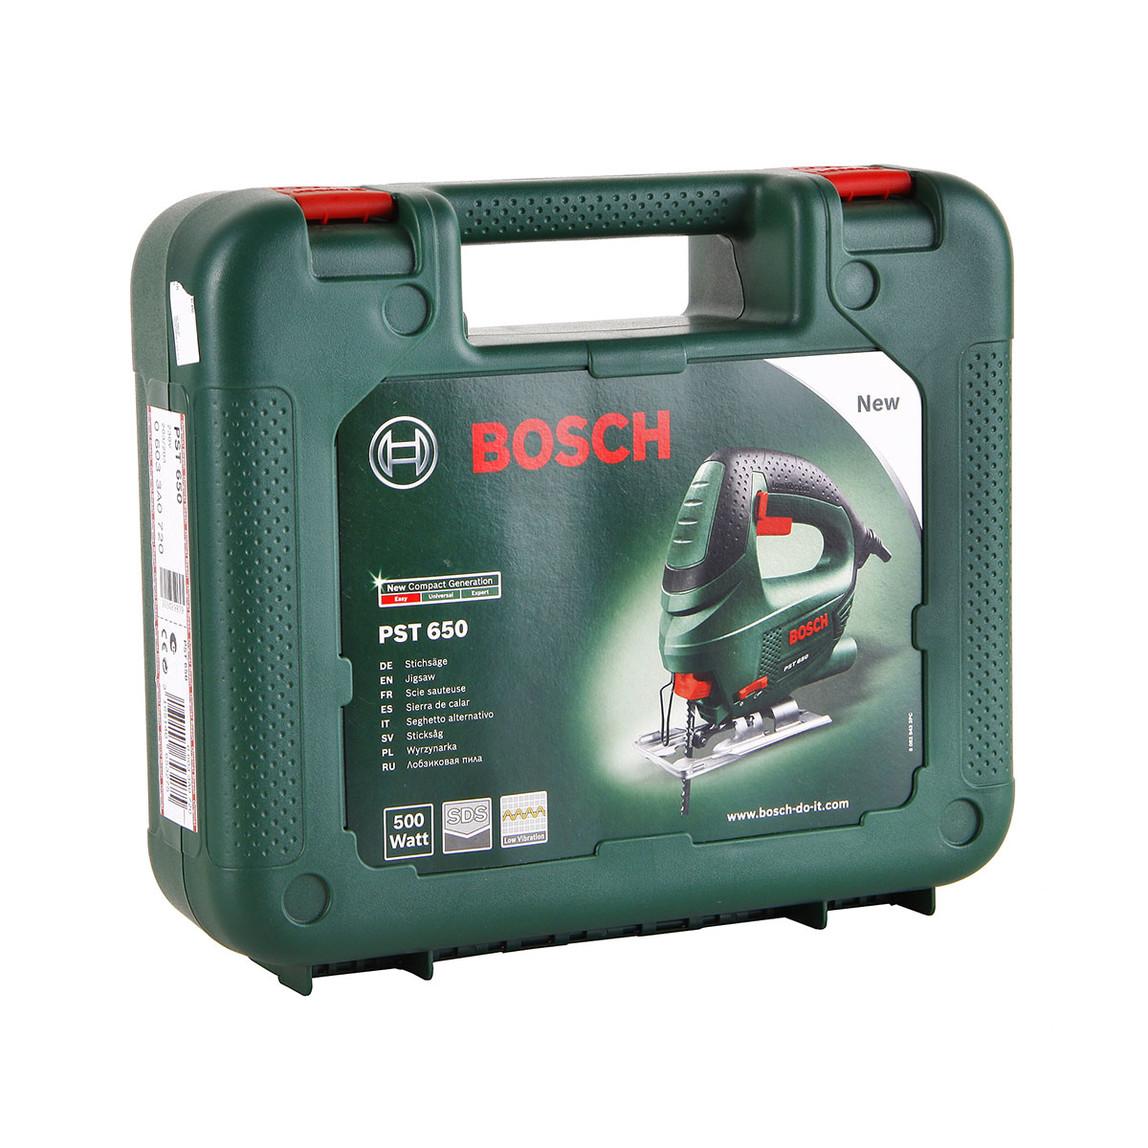 Bosch 500W Pst 650 Dekupaj Testere